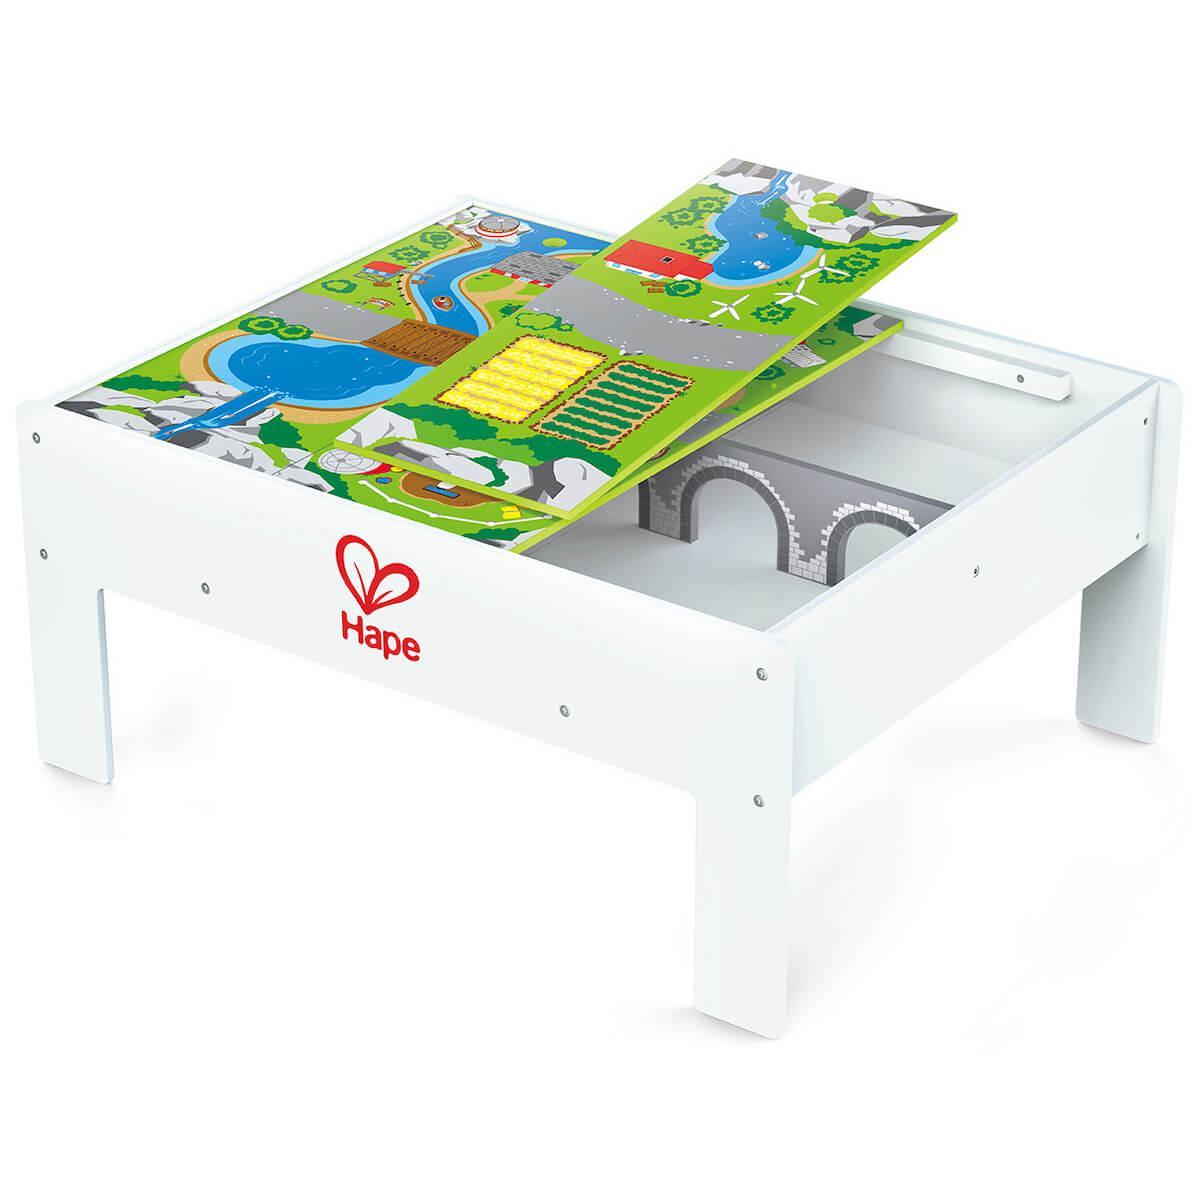 Spieltisch PLAY AND STOW Hape